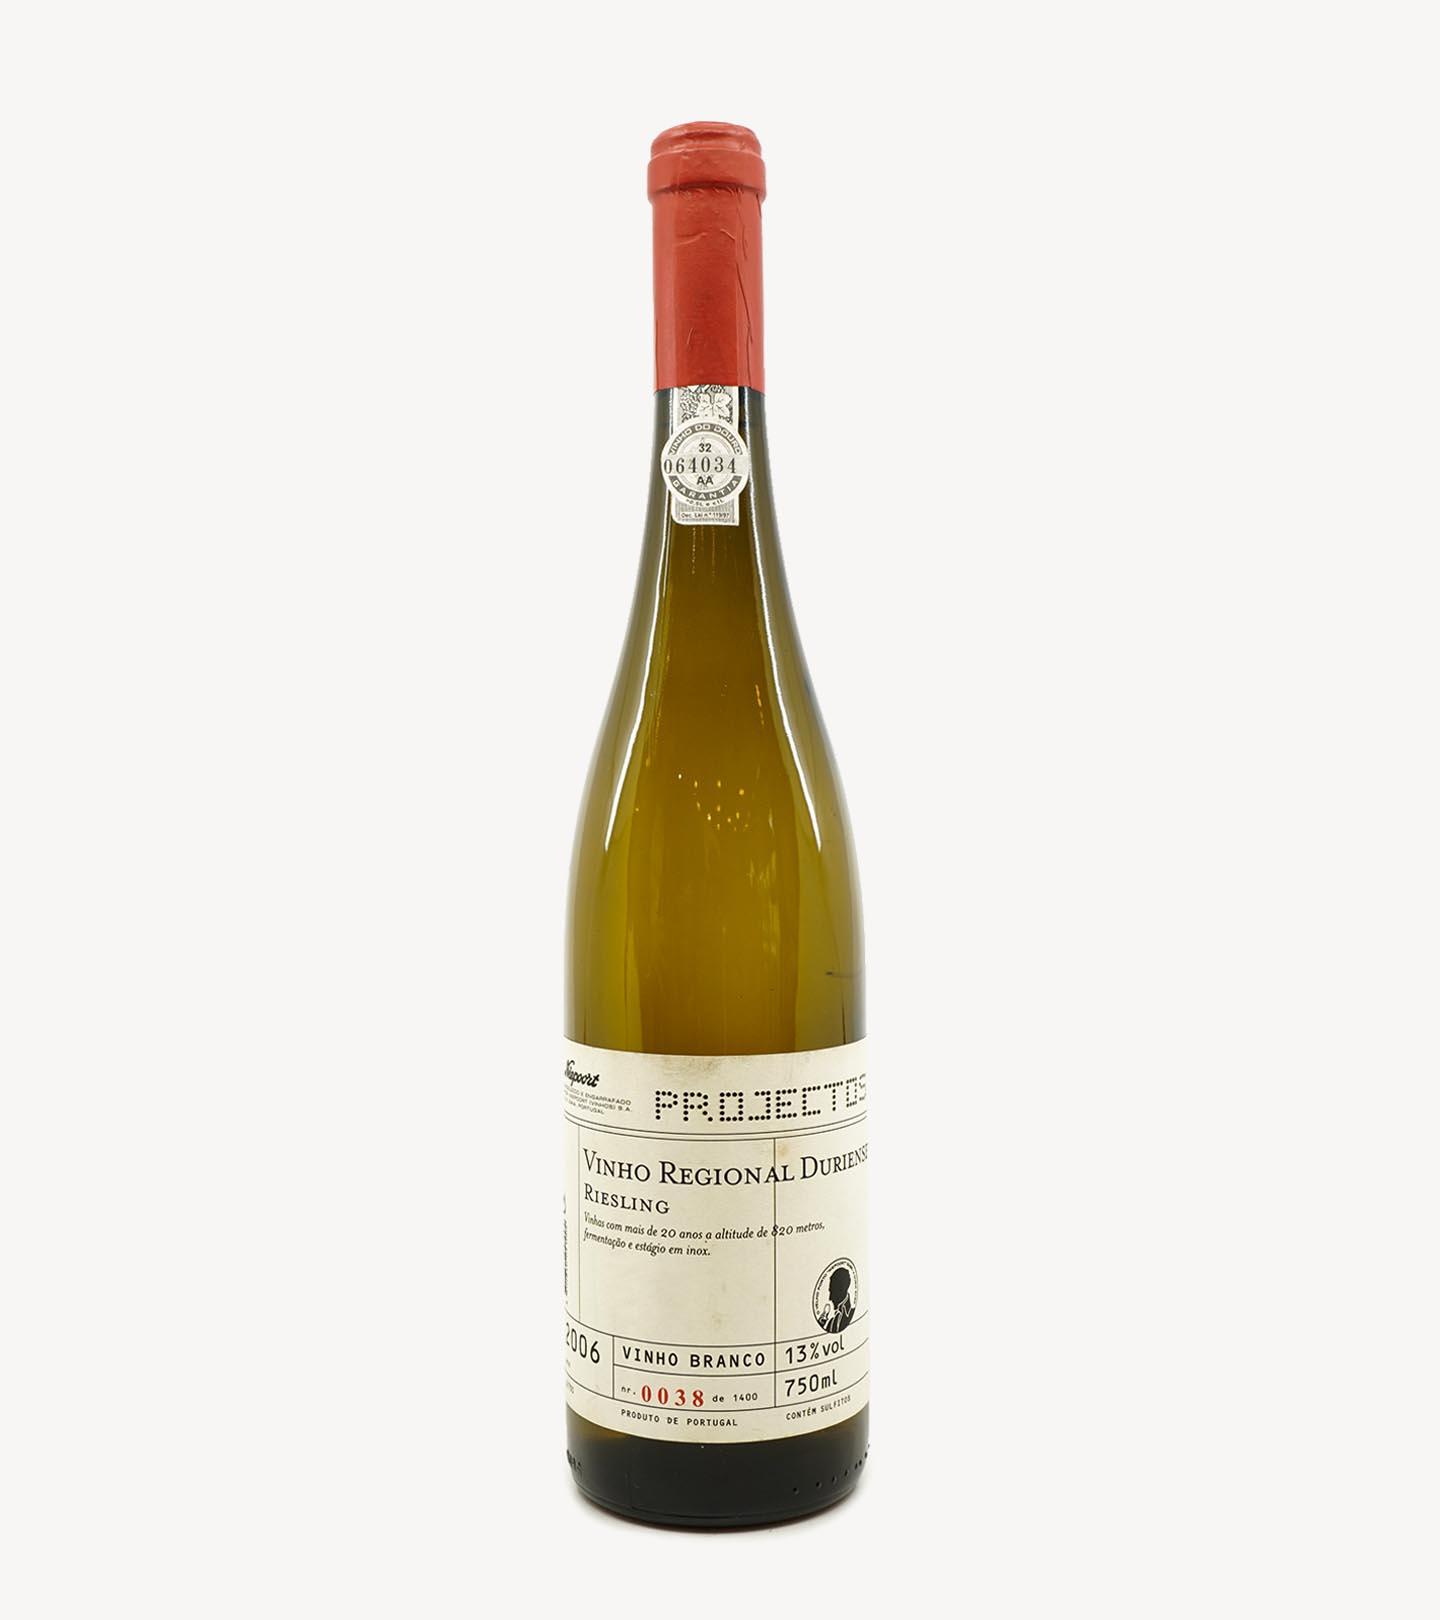 Vinho Branco Douro Riesling Projectos Niepoort 75cl